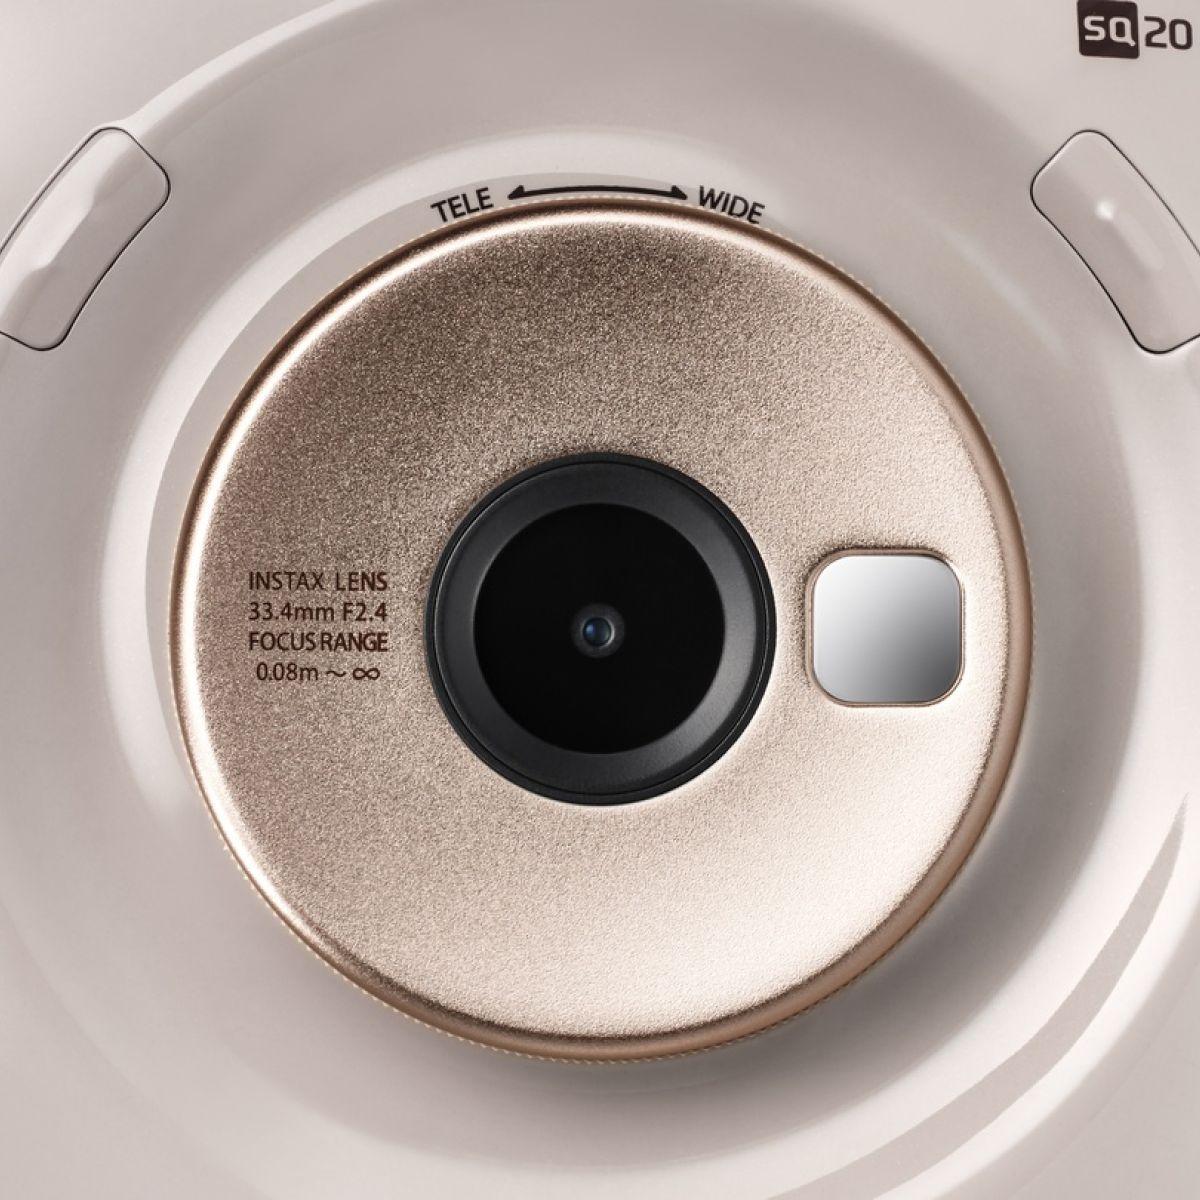 Fujifilm Instax Square SQ20: Right away your prints will come